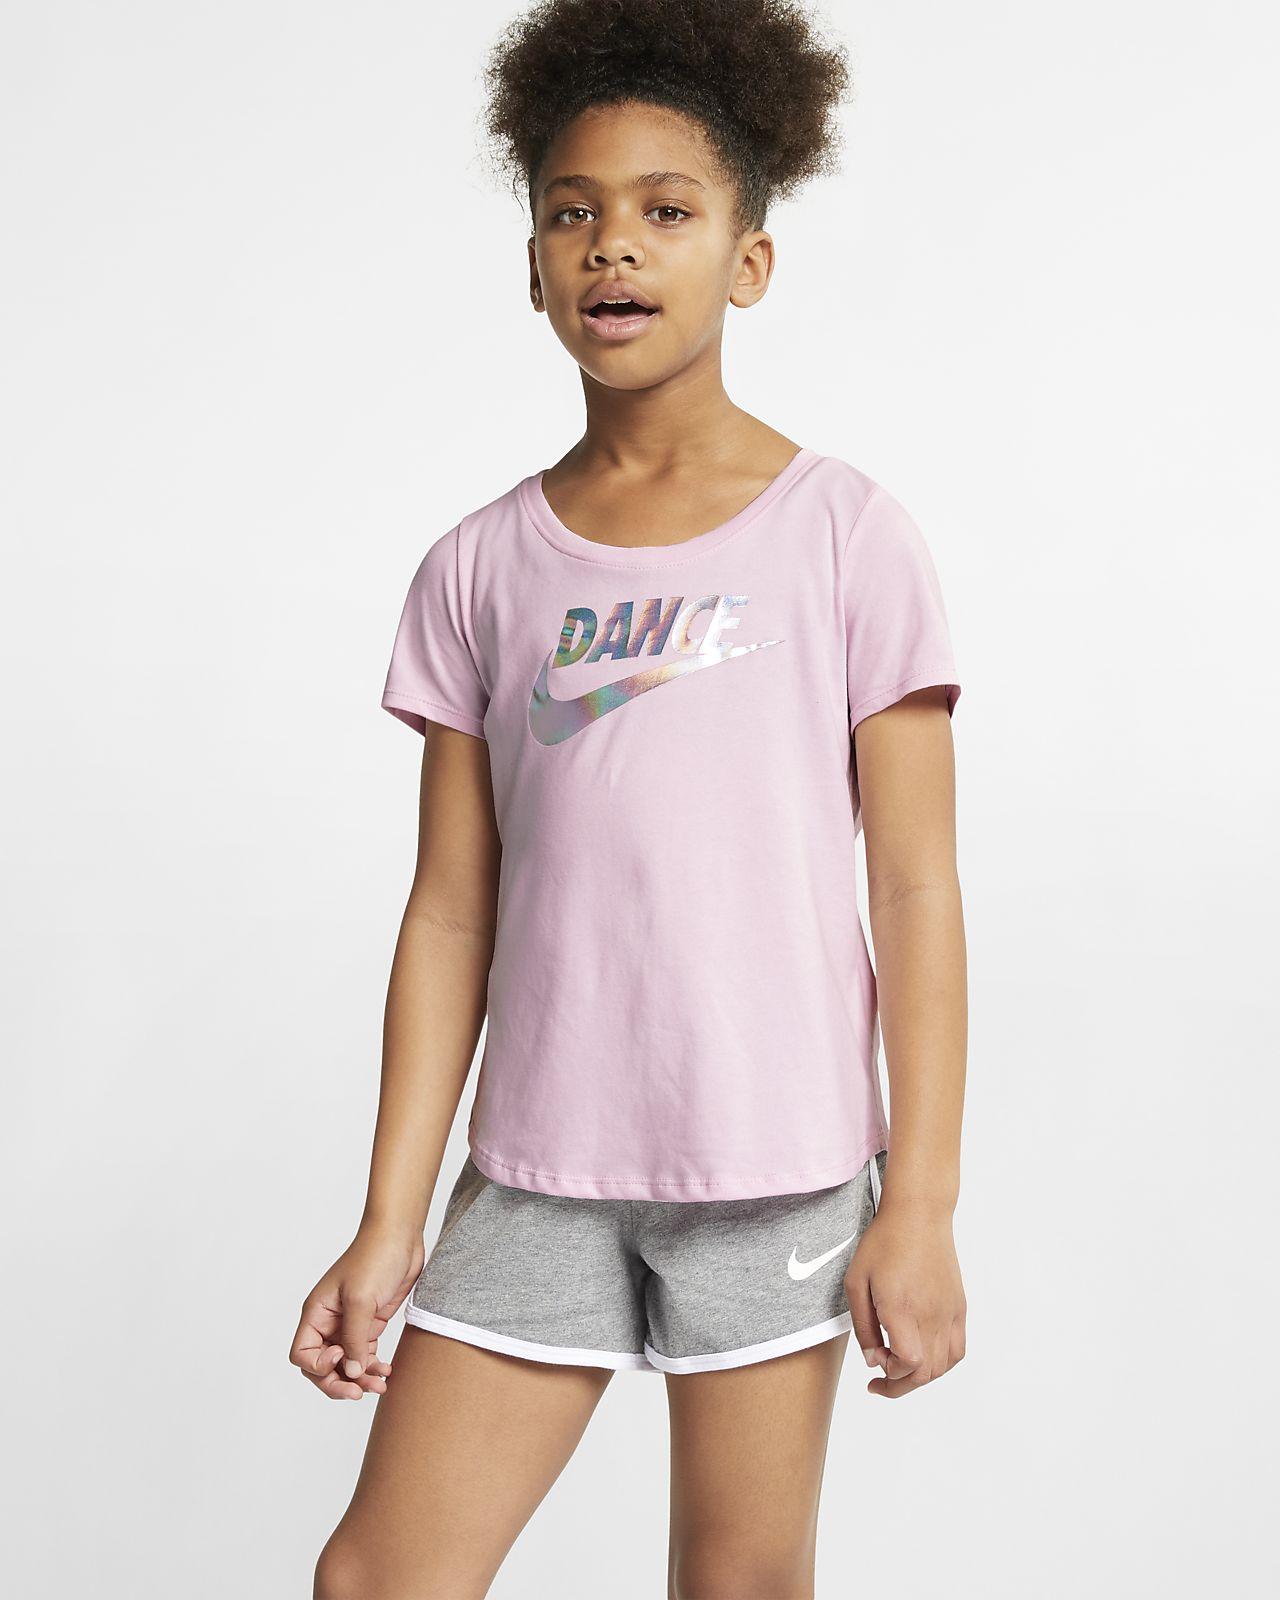 Tee-shirt Nike Dri-FIT pour Fille plus âgée